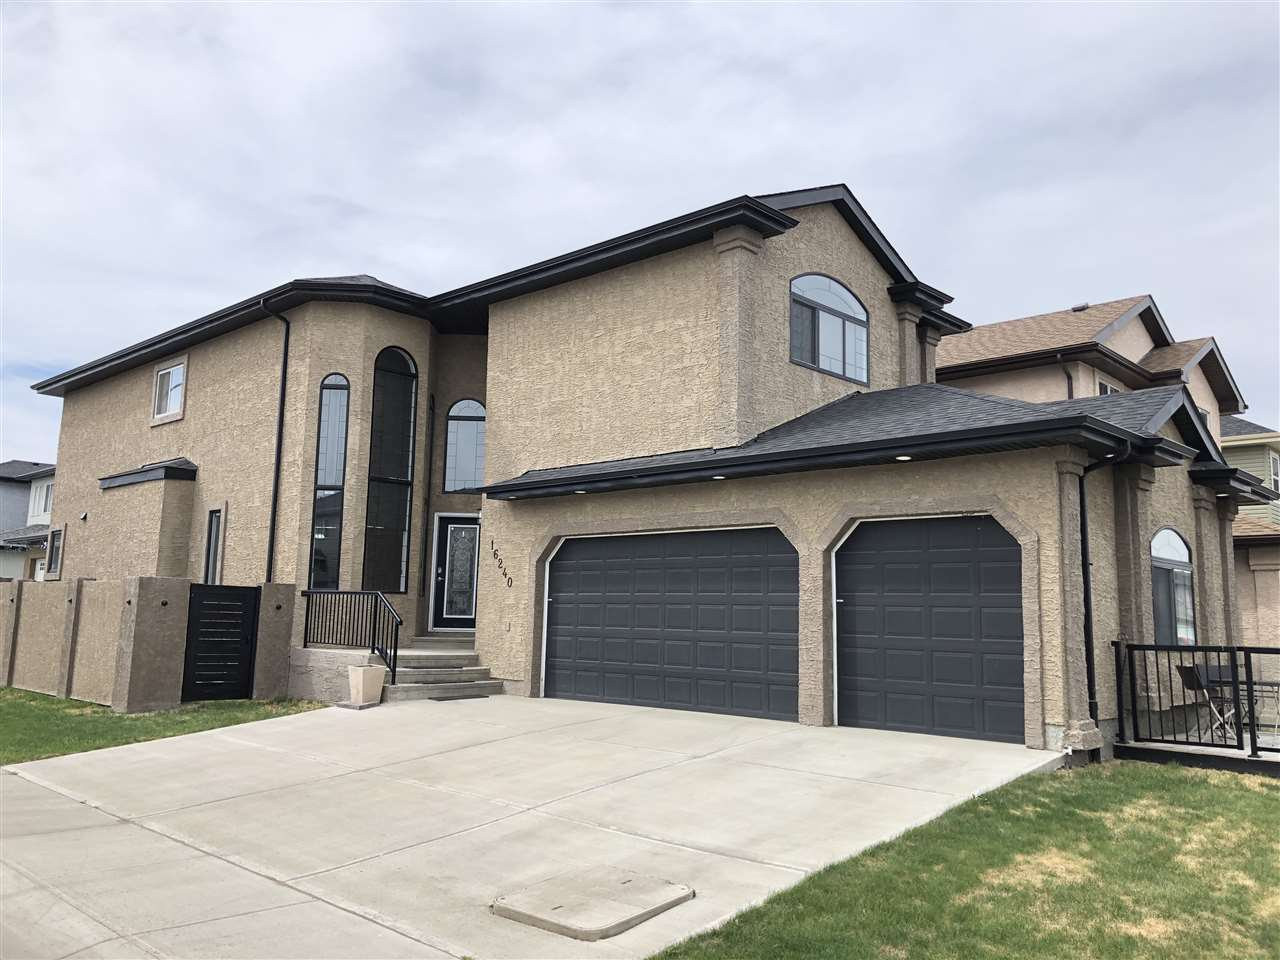 Main Photo: 16240 134 Street in Edmonton: Zone 27 House for sale : MLS®# E4181396